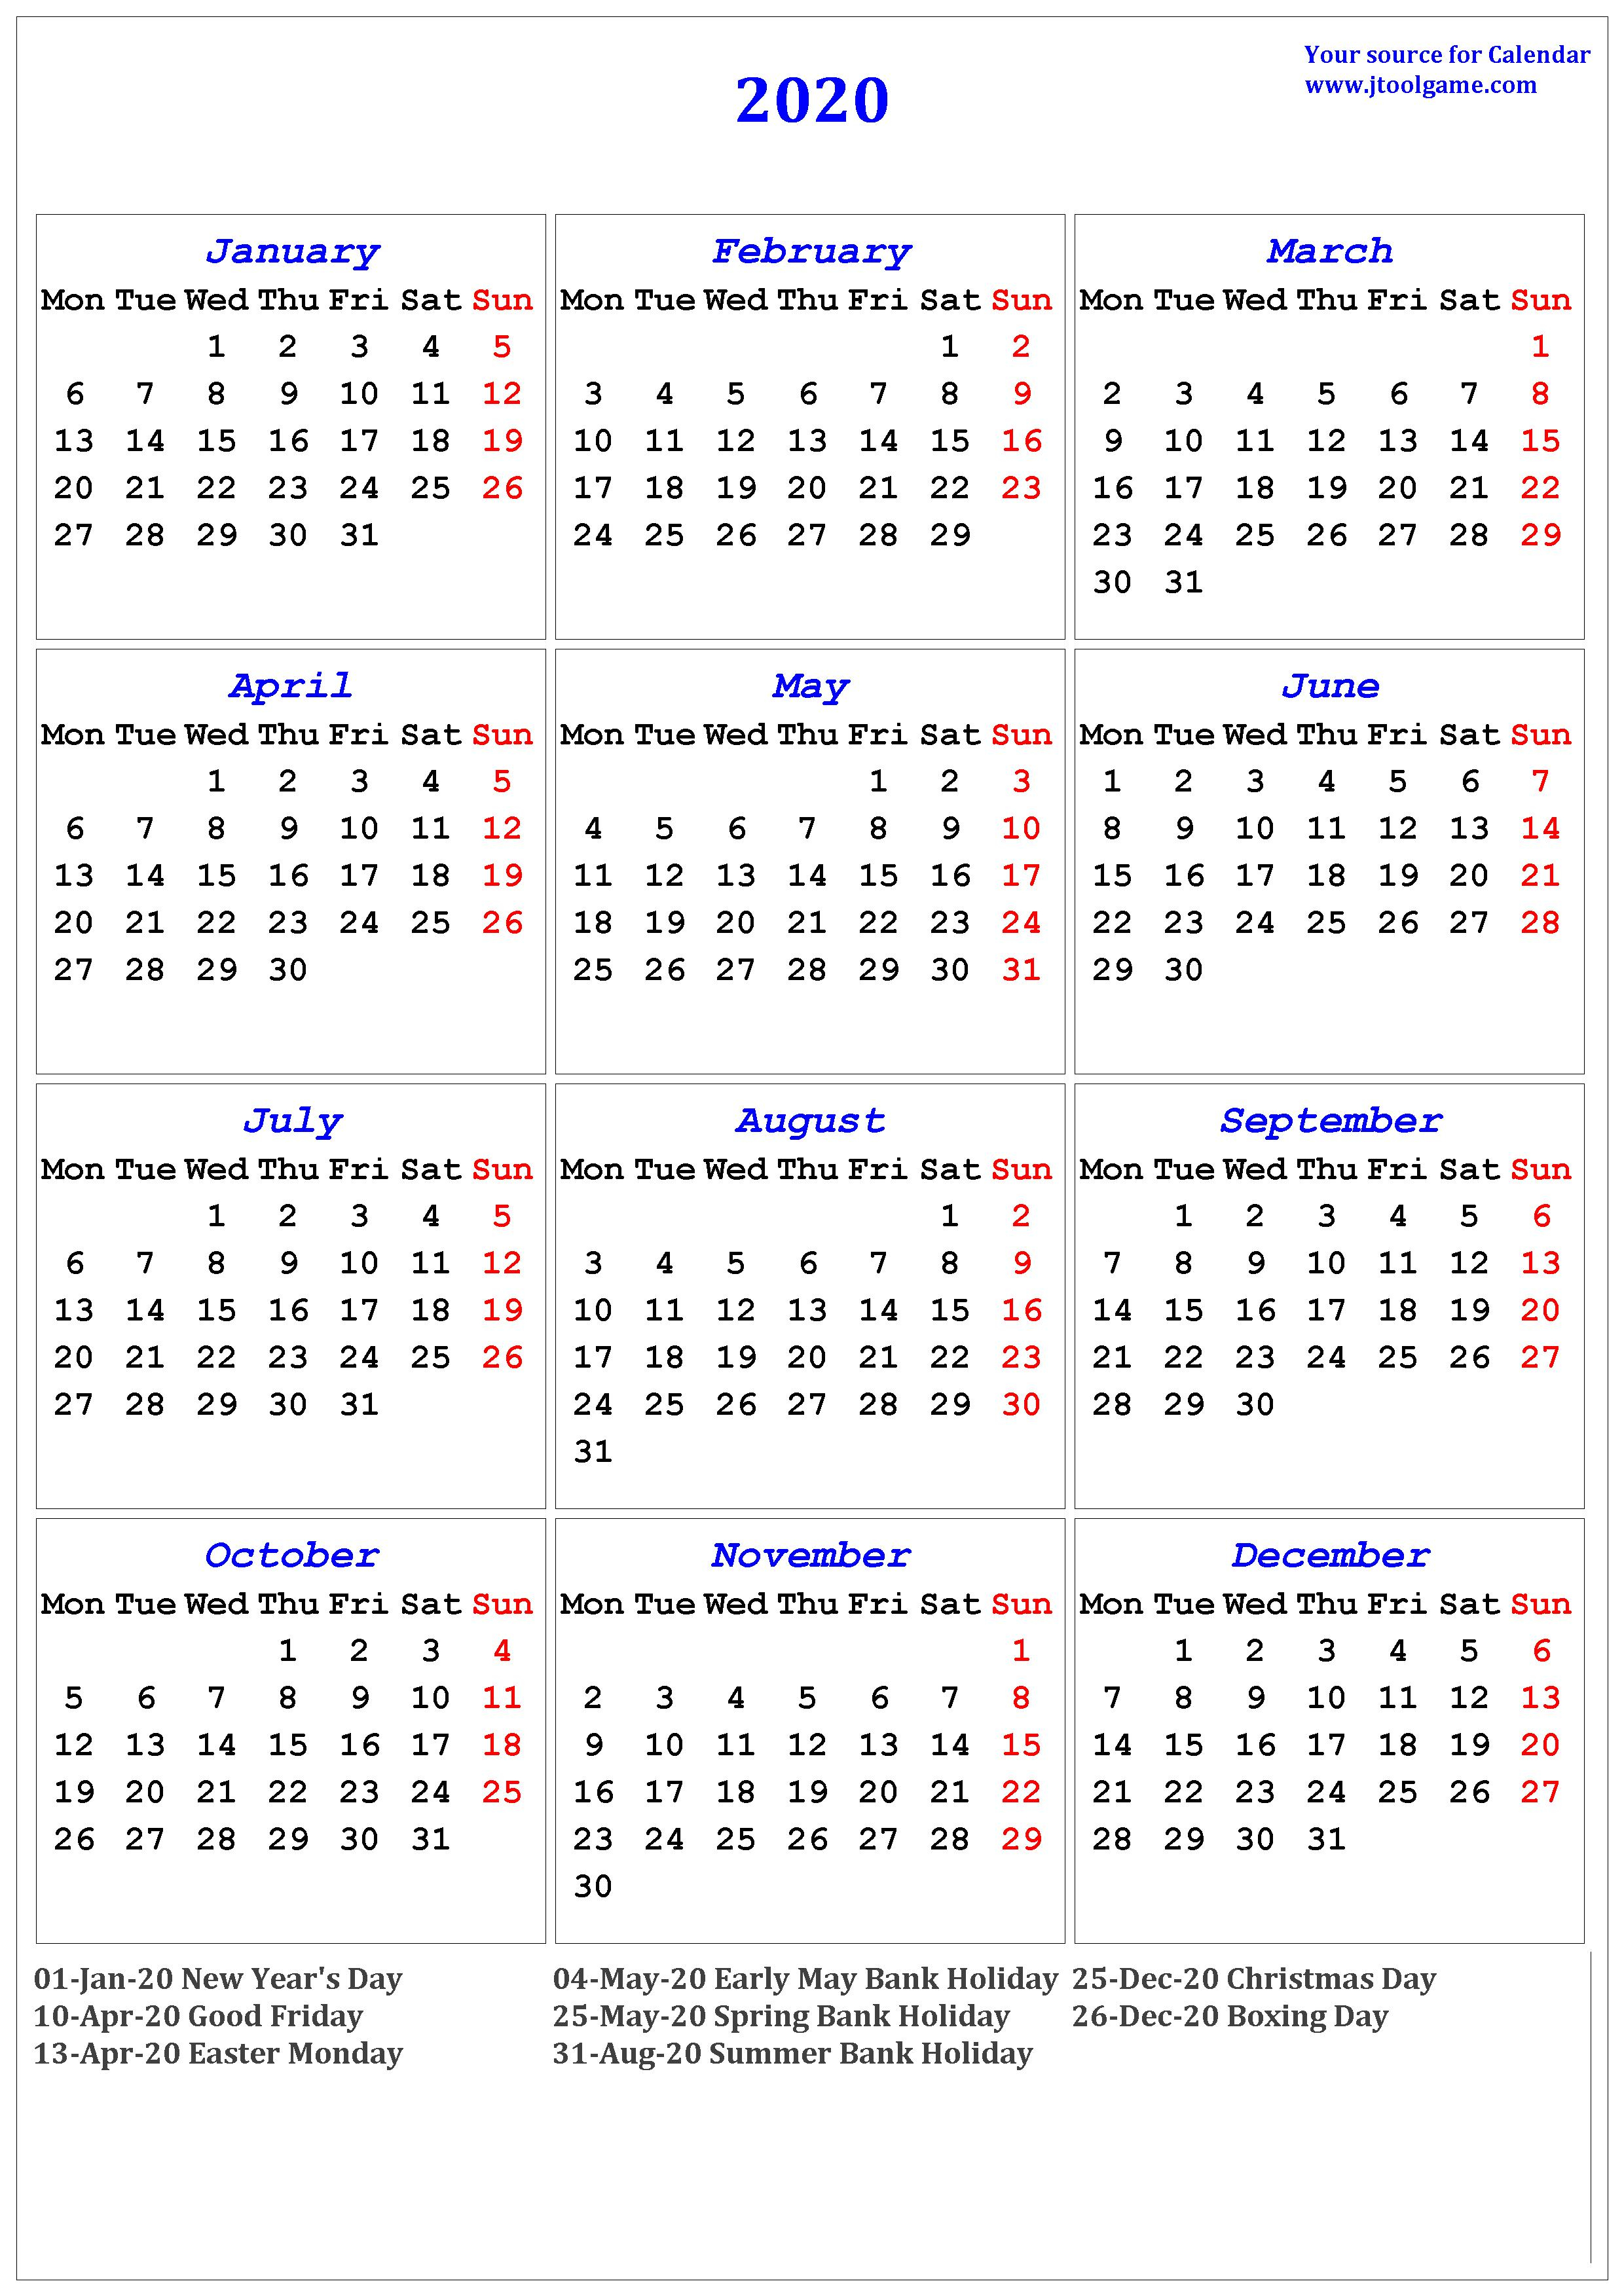 2020 Calendar - Printable Calendar. 2020 Calendar In